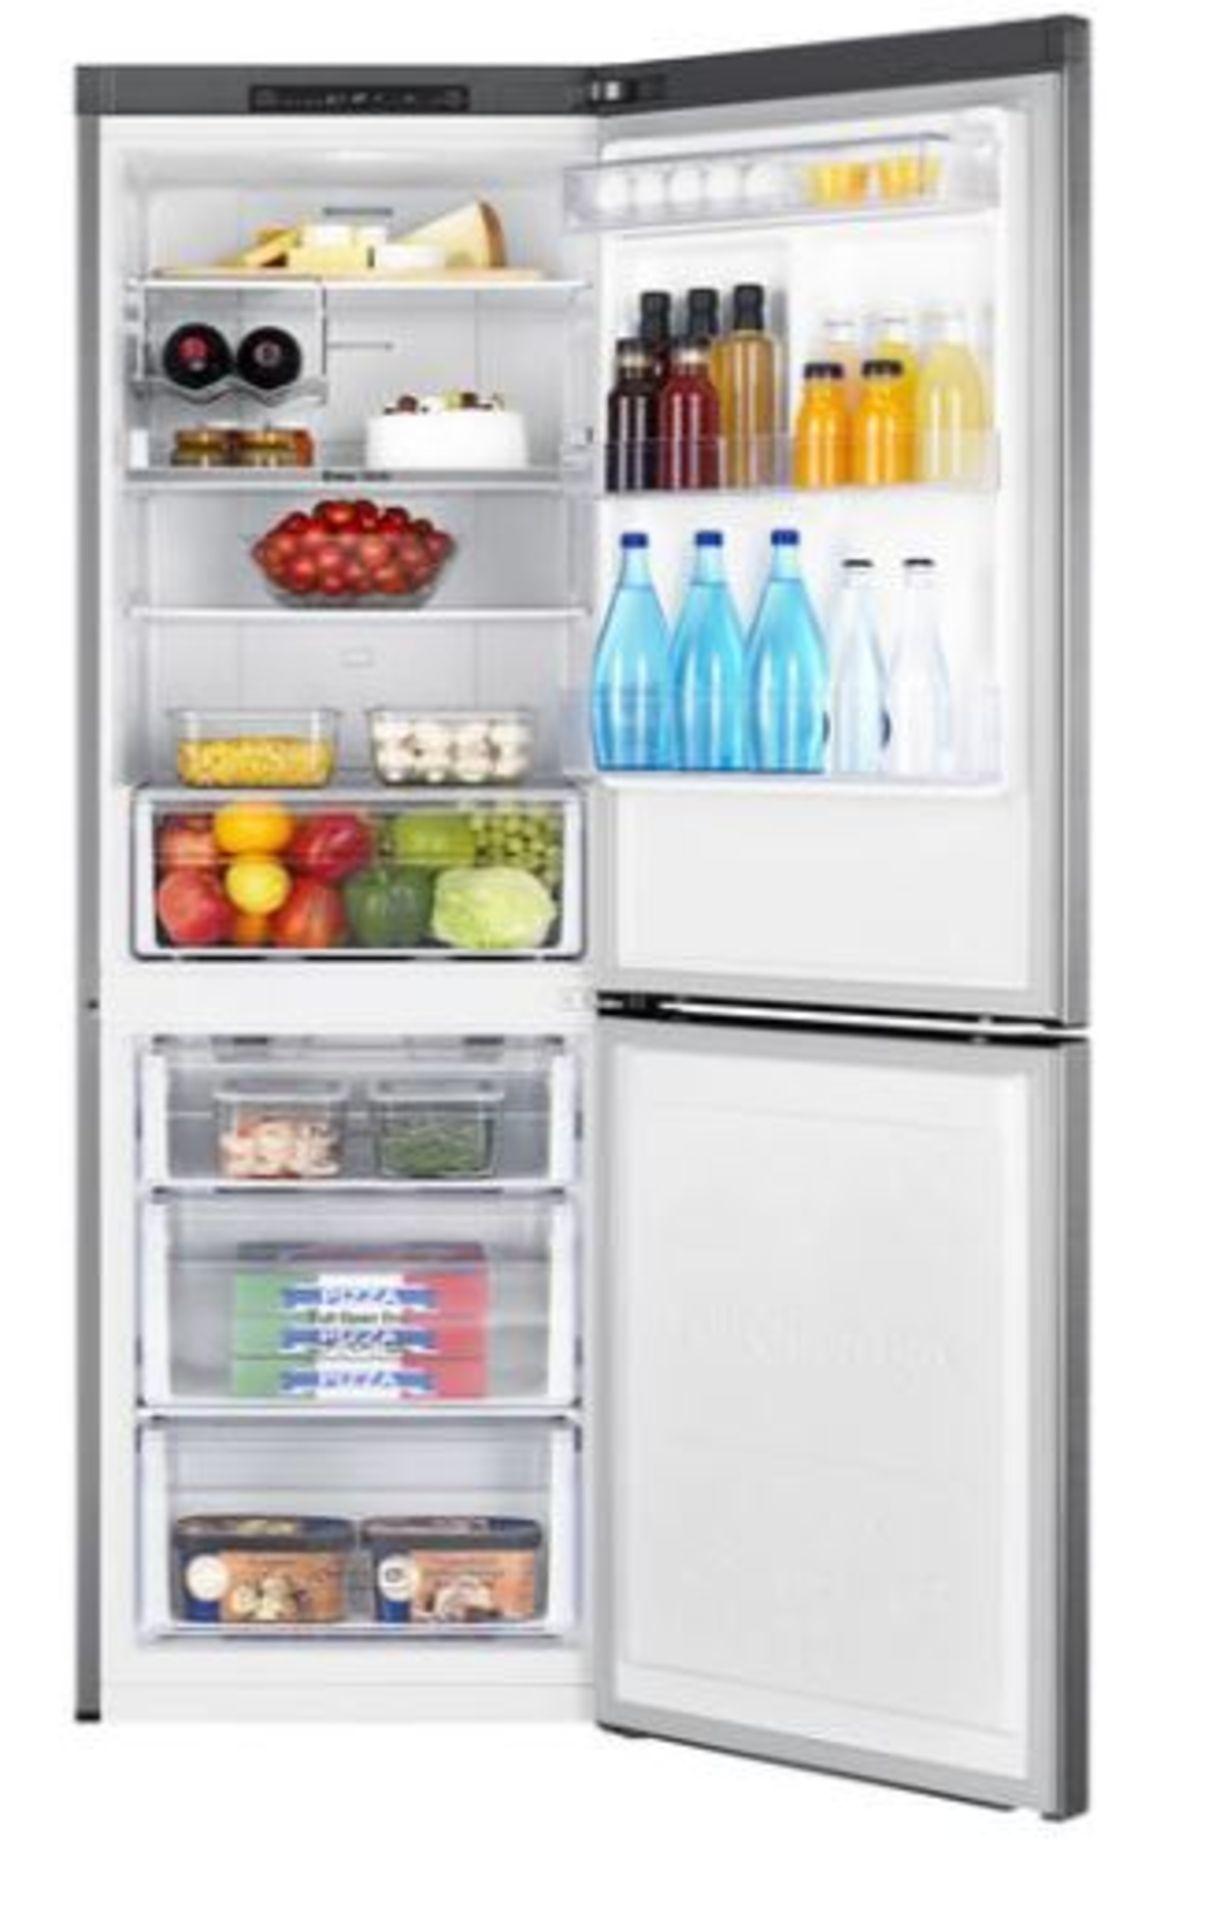 Pallet of 1 Samsung 60CM Fridge Freezer. Latest selling price £399 - Image 3 of 7